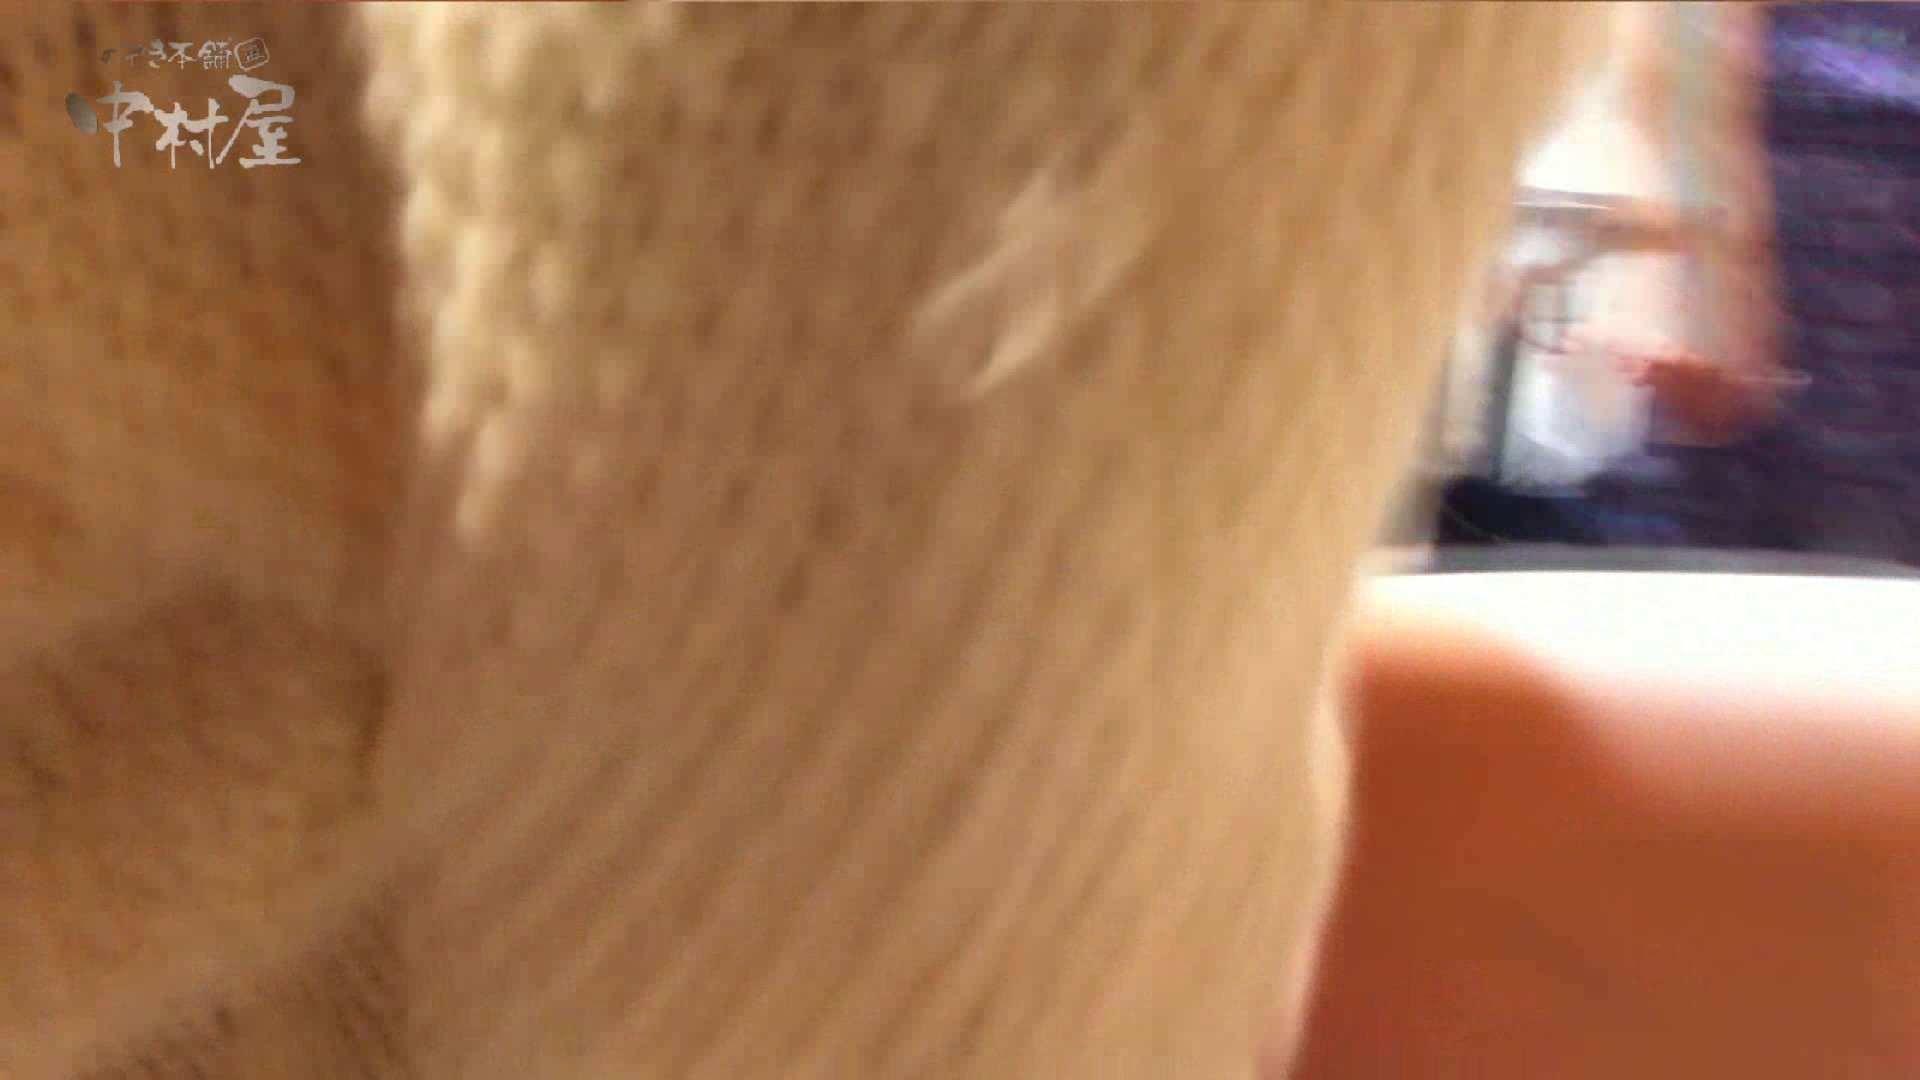 vol.73 美人アパレル胸チラ&パンチラ 目の下のホクロがエッチな店員さん パンチラ おまんこ無修正動画無料 95連発 59